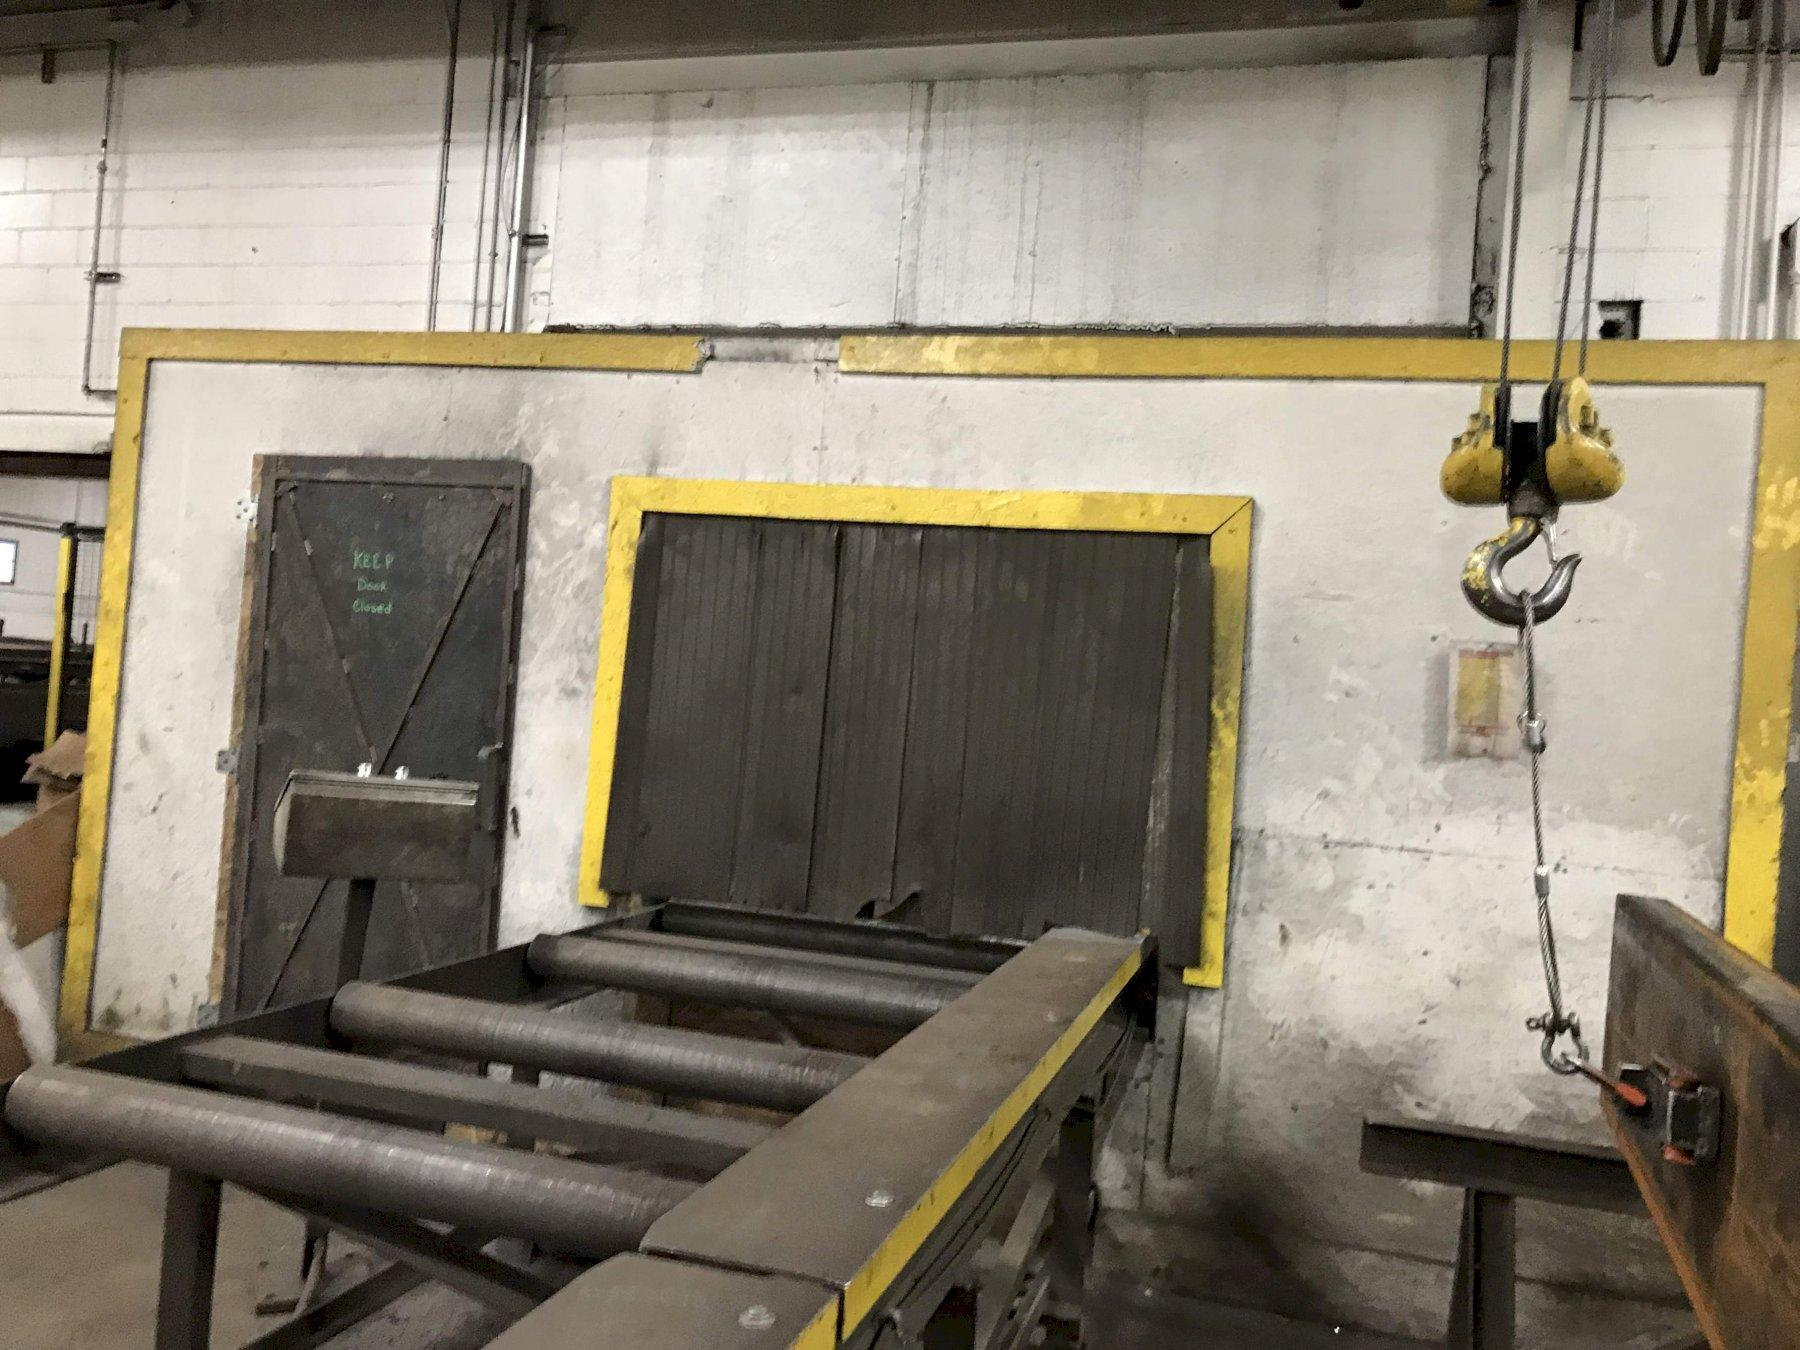 PANGBORN 4 WHEEL PLATE BLAST CLEANING LINE: STOCK #71706